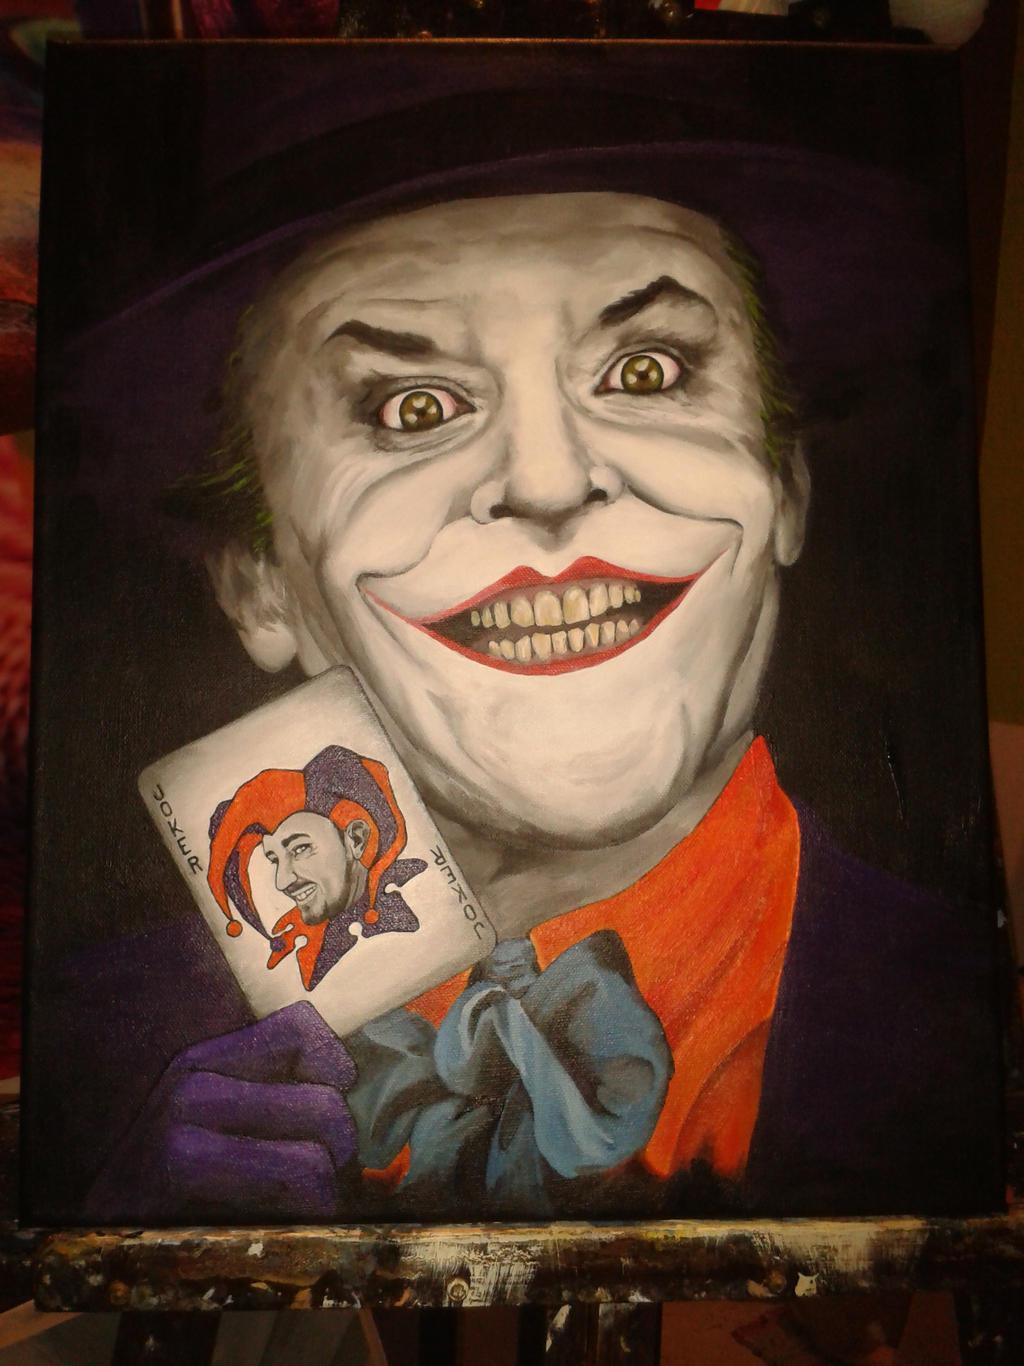 Jack Nicholson As Joker Quotes. QuotesGram